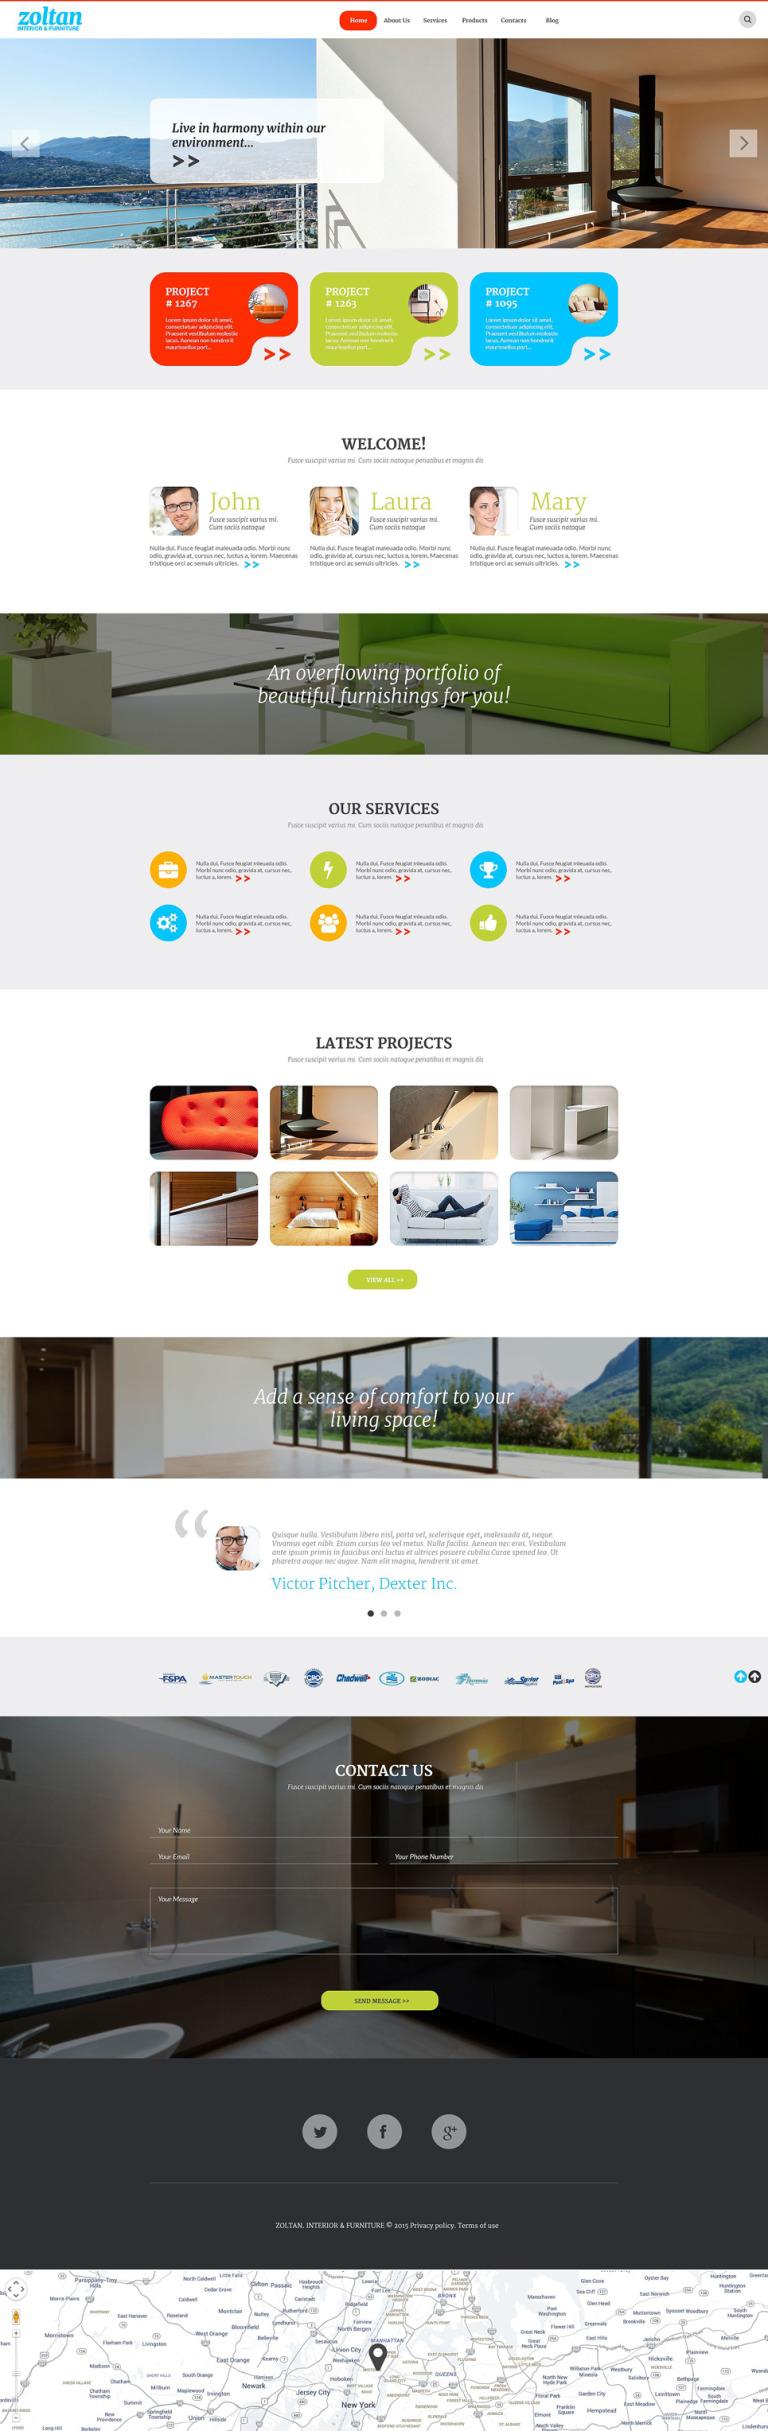 Zoltan WordPress Theme New Screenshots BIG